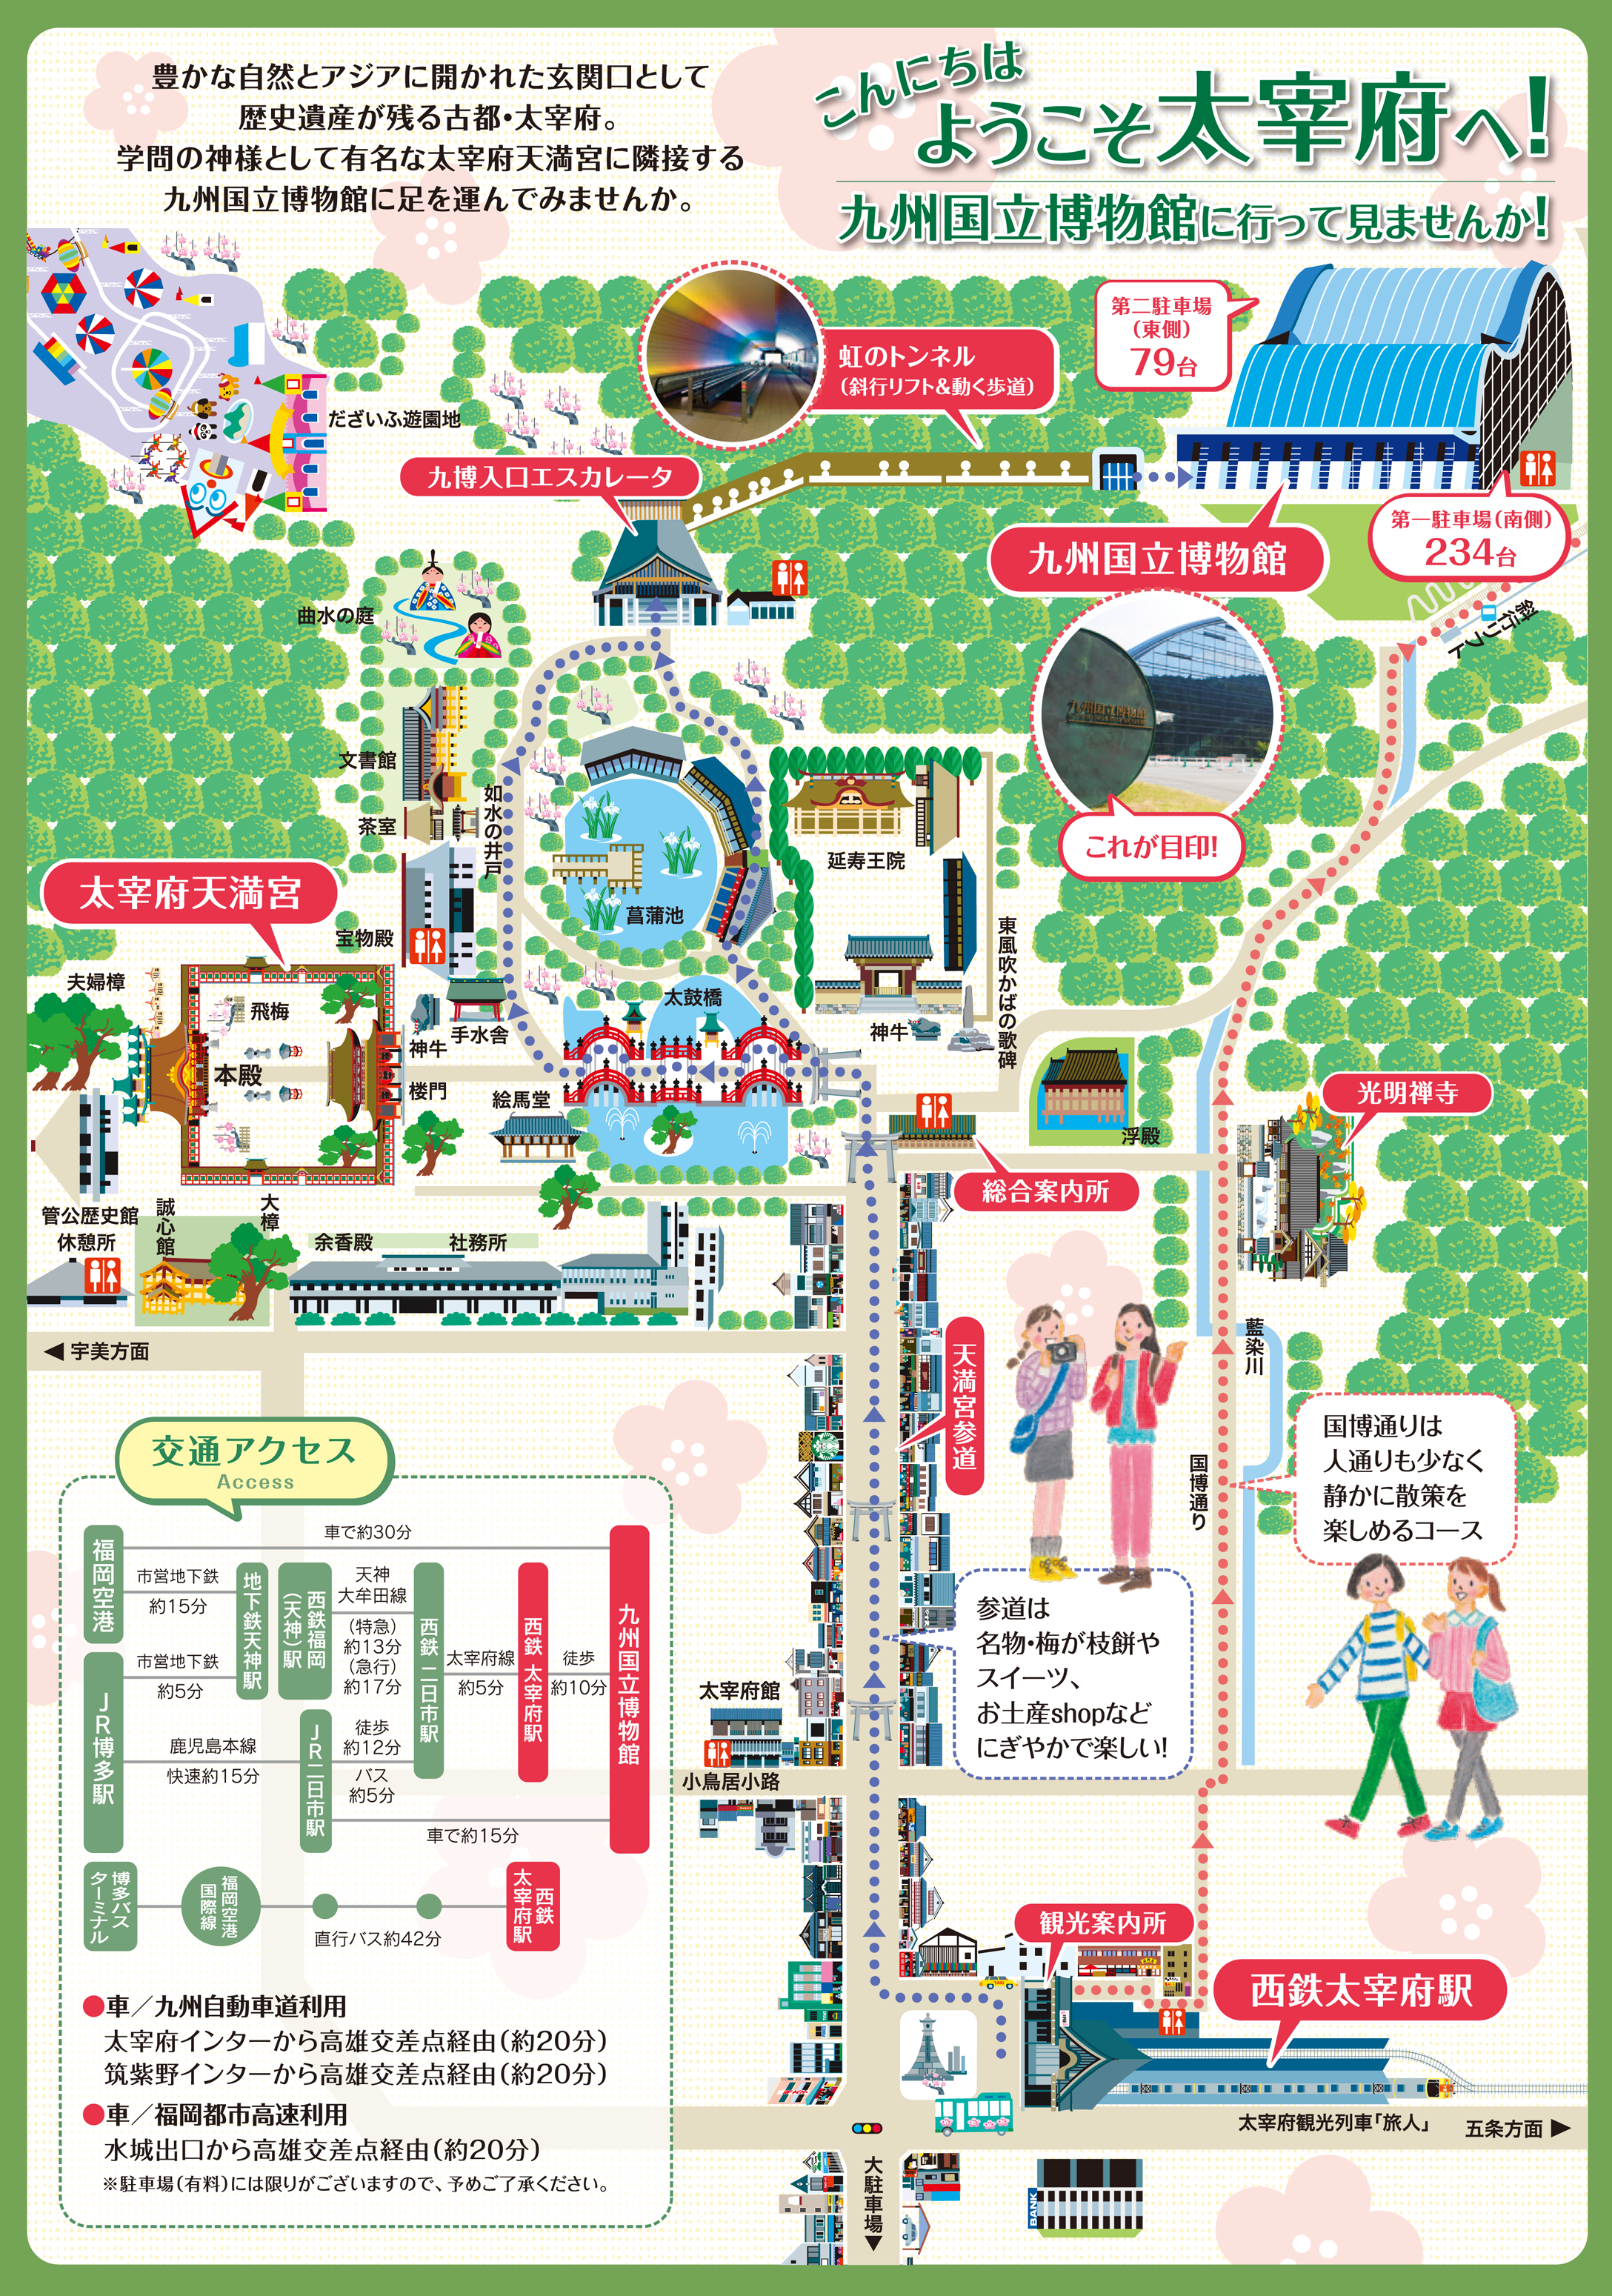 FFJ 九州国立博物館の太宰府周辺マップ